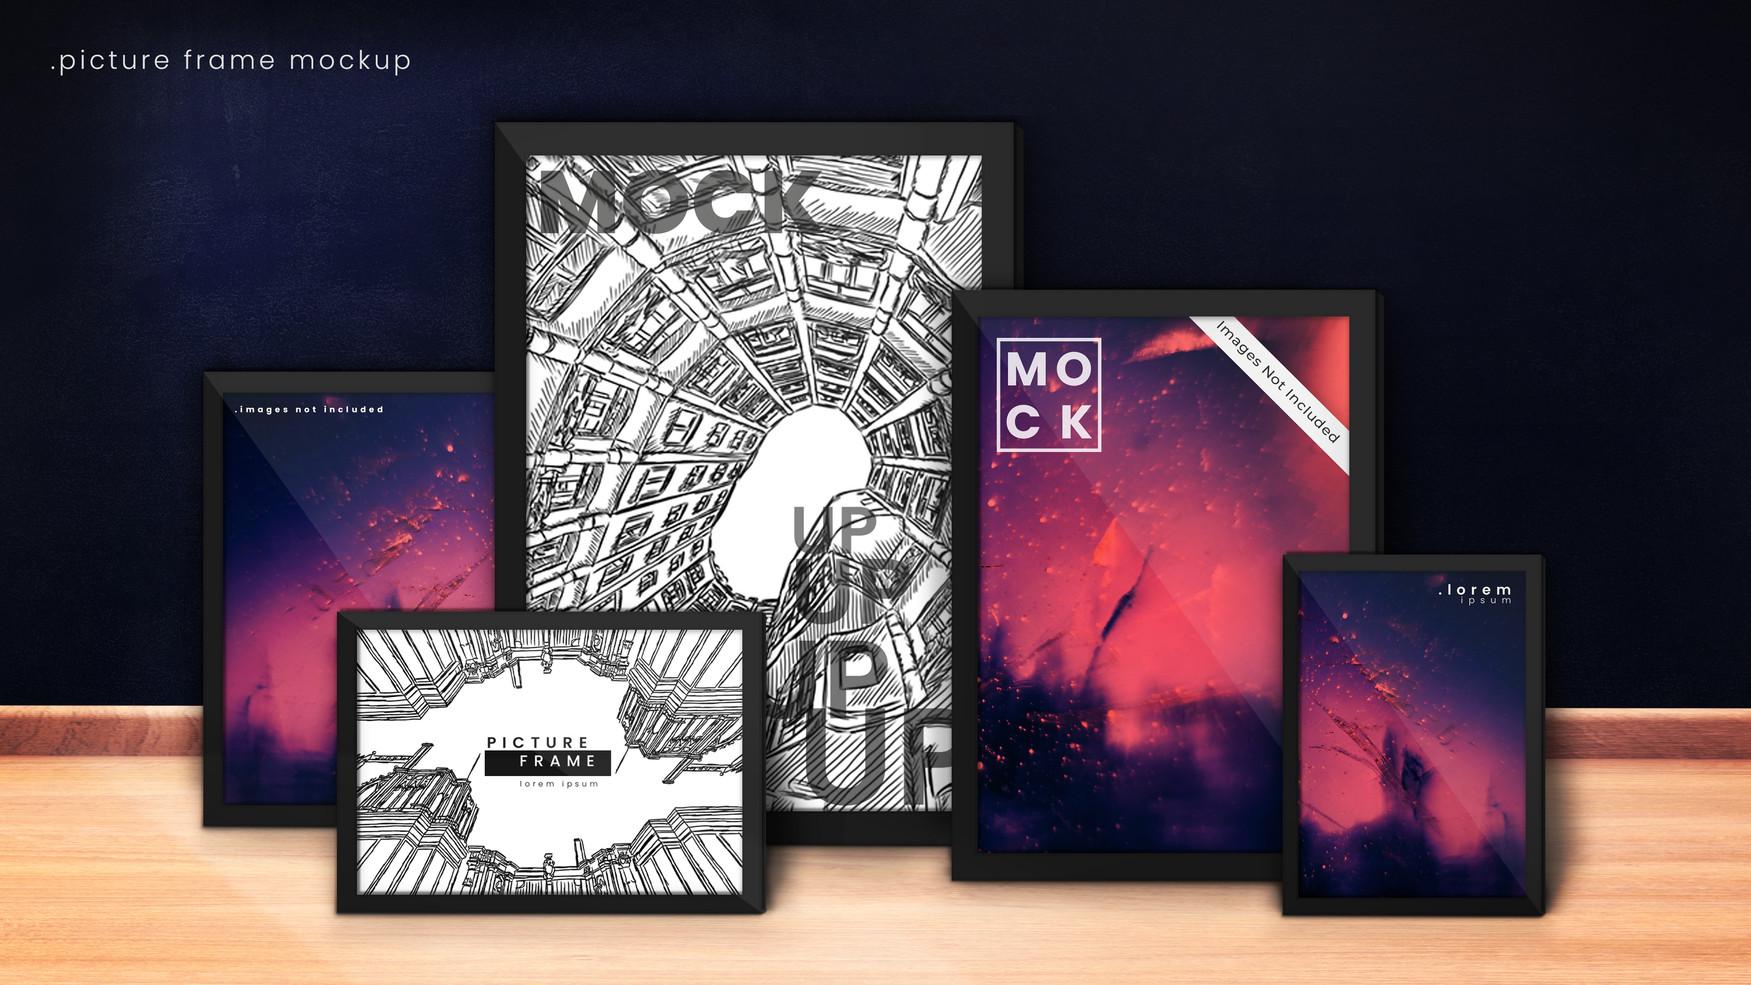 Dark Blue Picture Frame Mockup FP.jpg